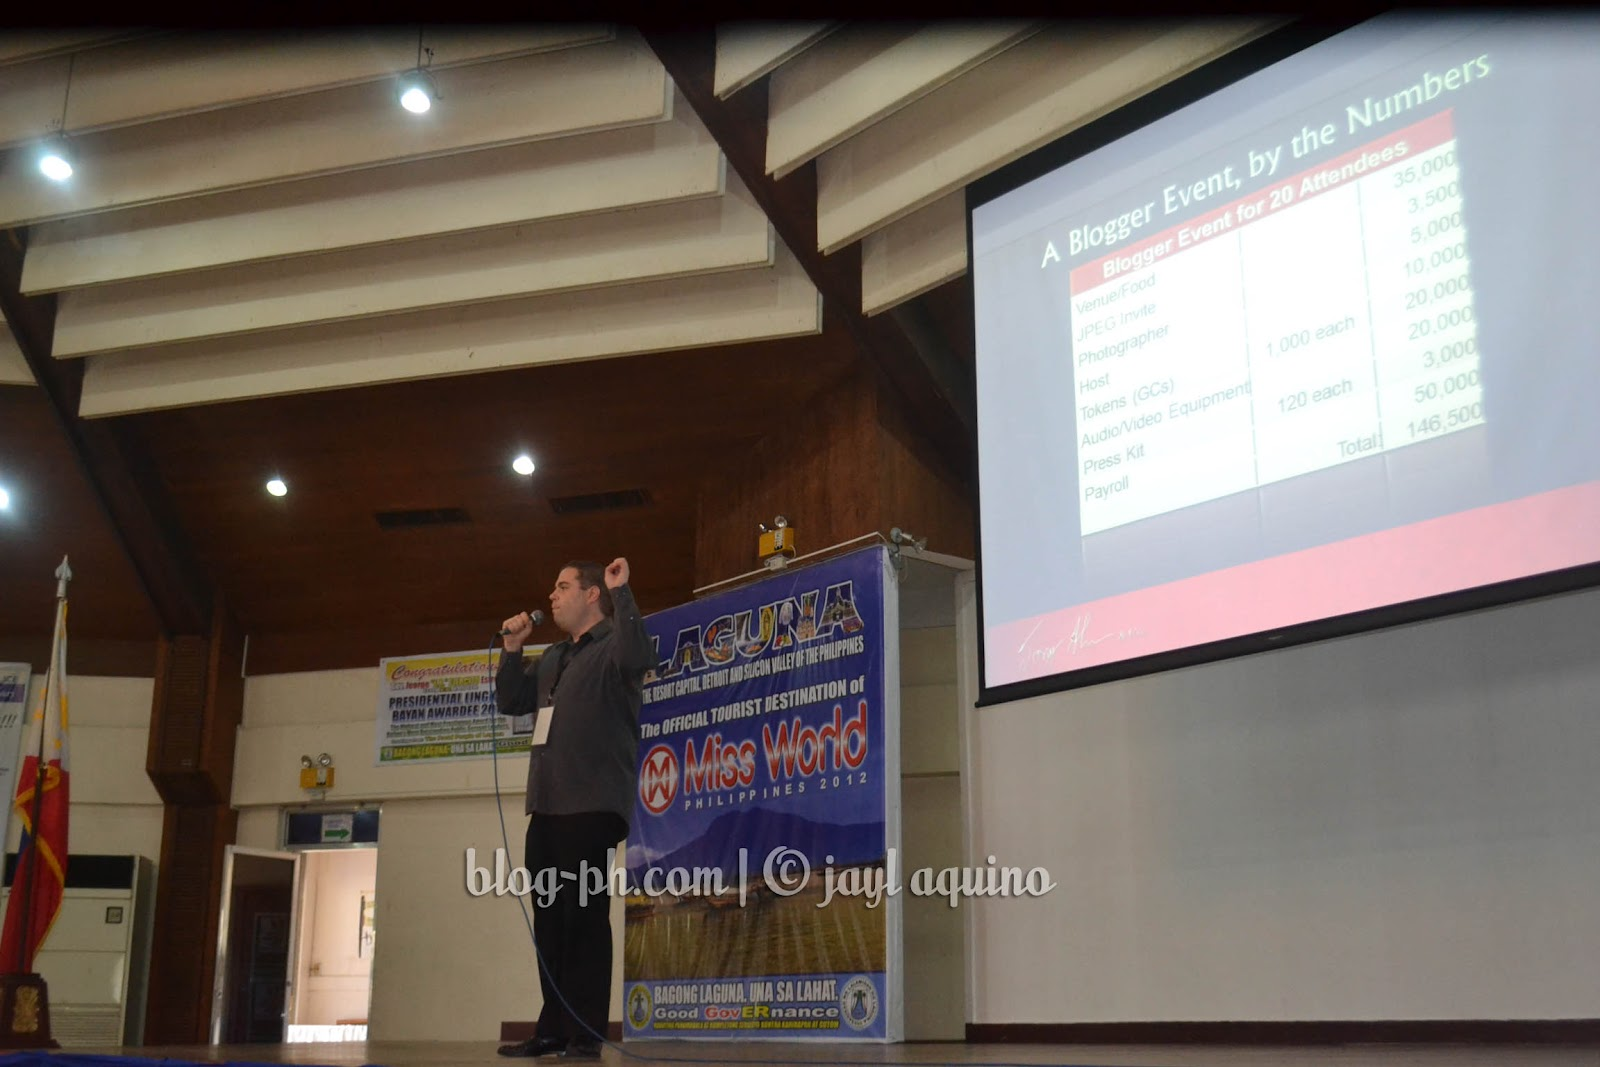 PHOTOS] #1LaBS: 1st Laguna Social Media & Blogging Summit | BLOG-PH